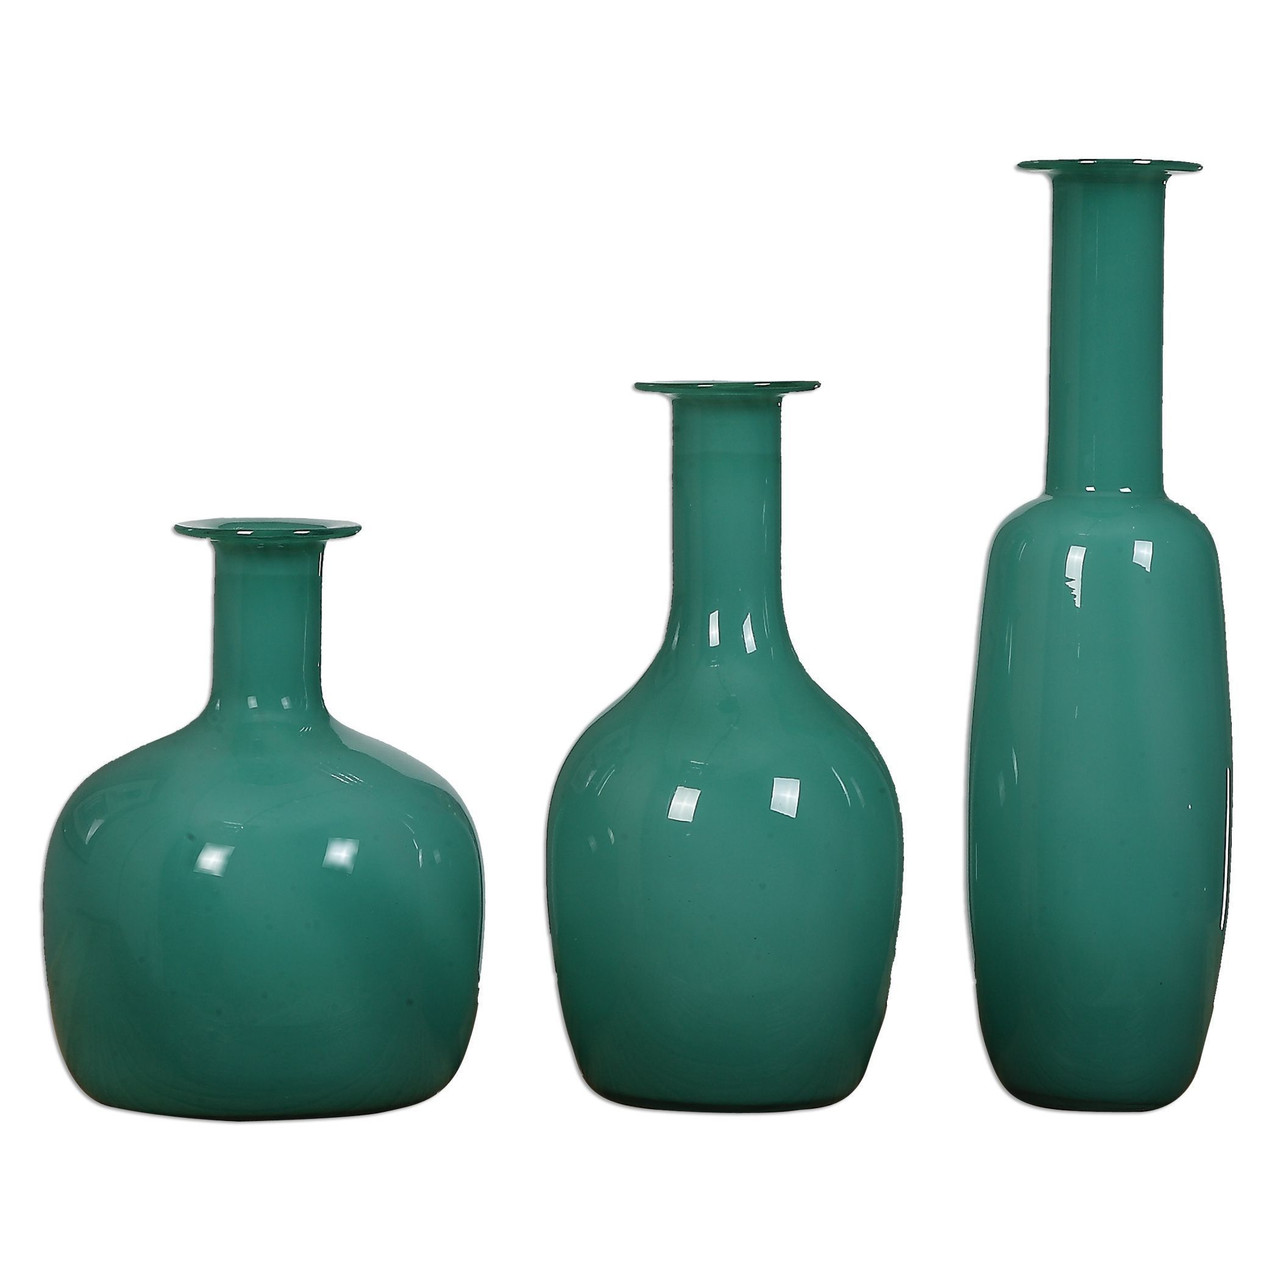 Vases Urns & Finials